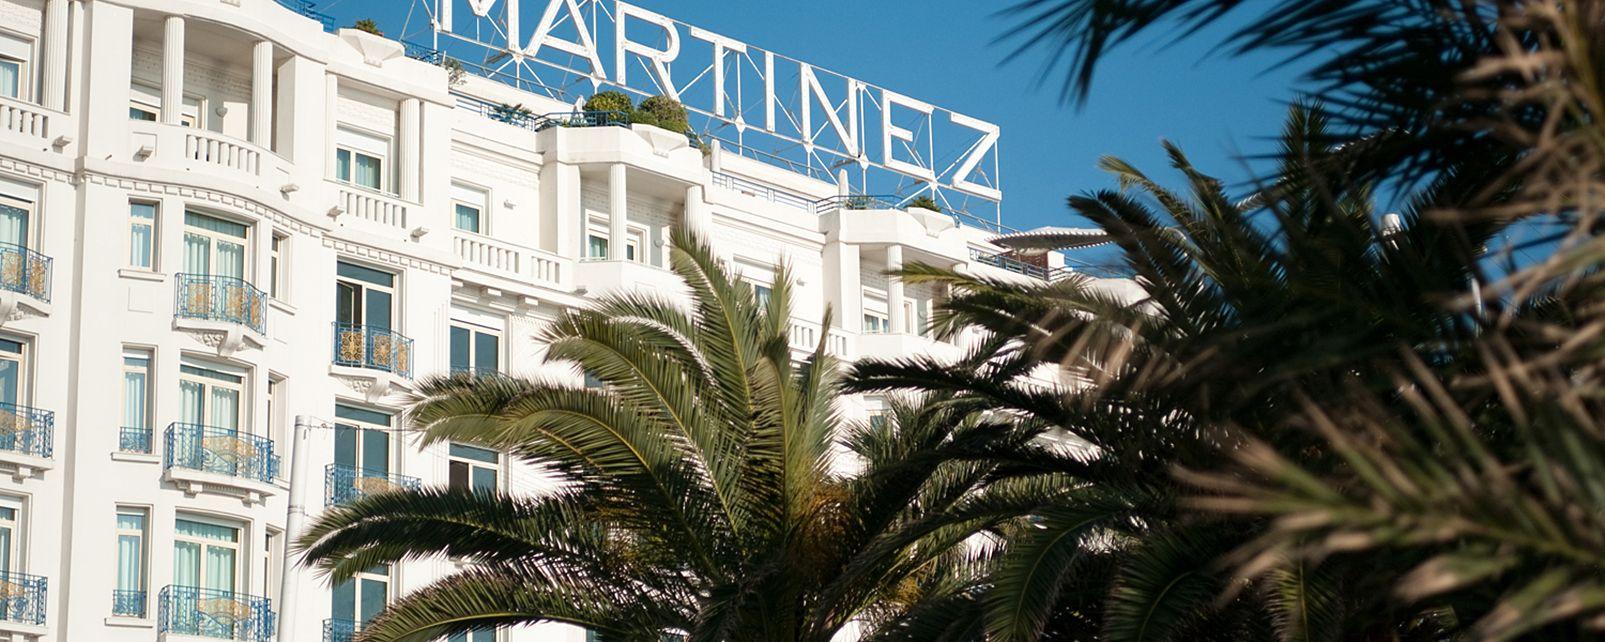 Hôtel Grand Hyatt Cannes Martinez